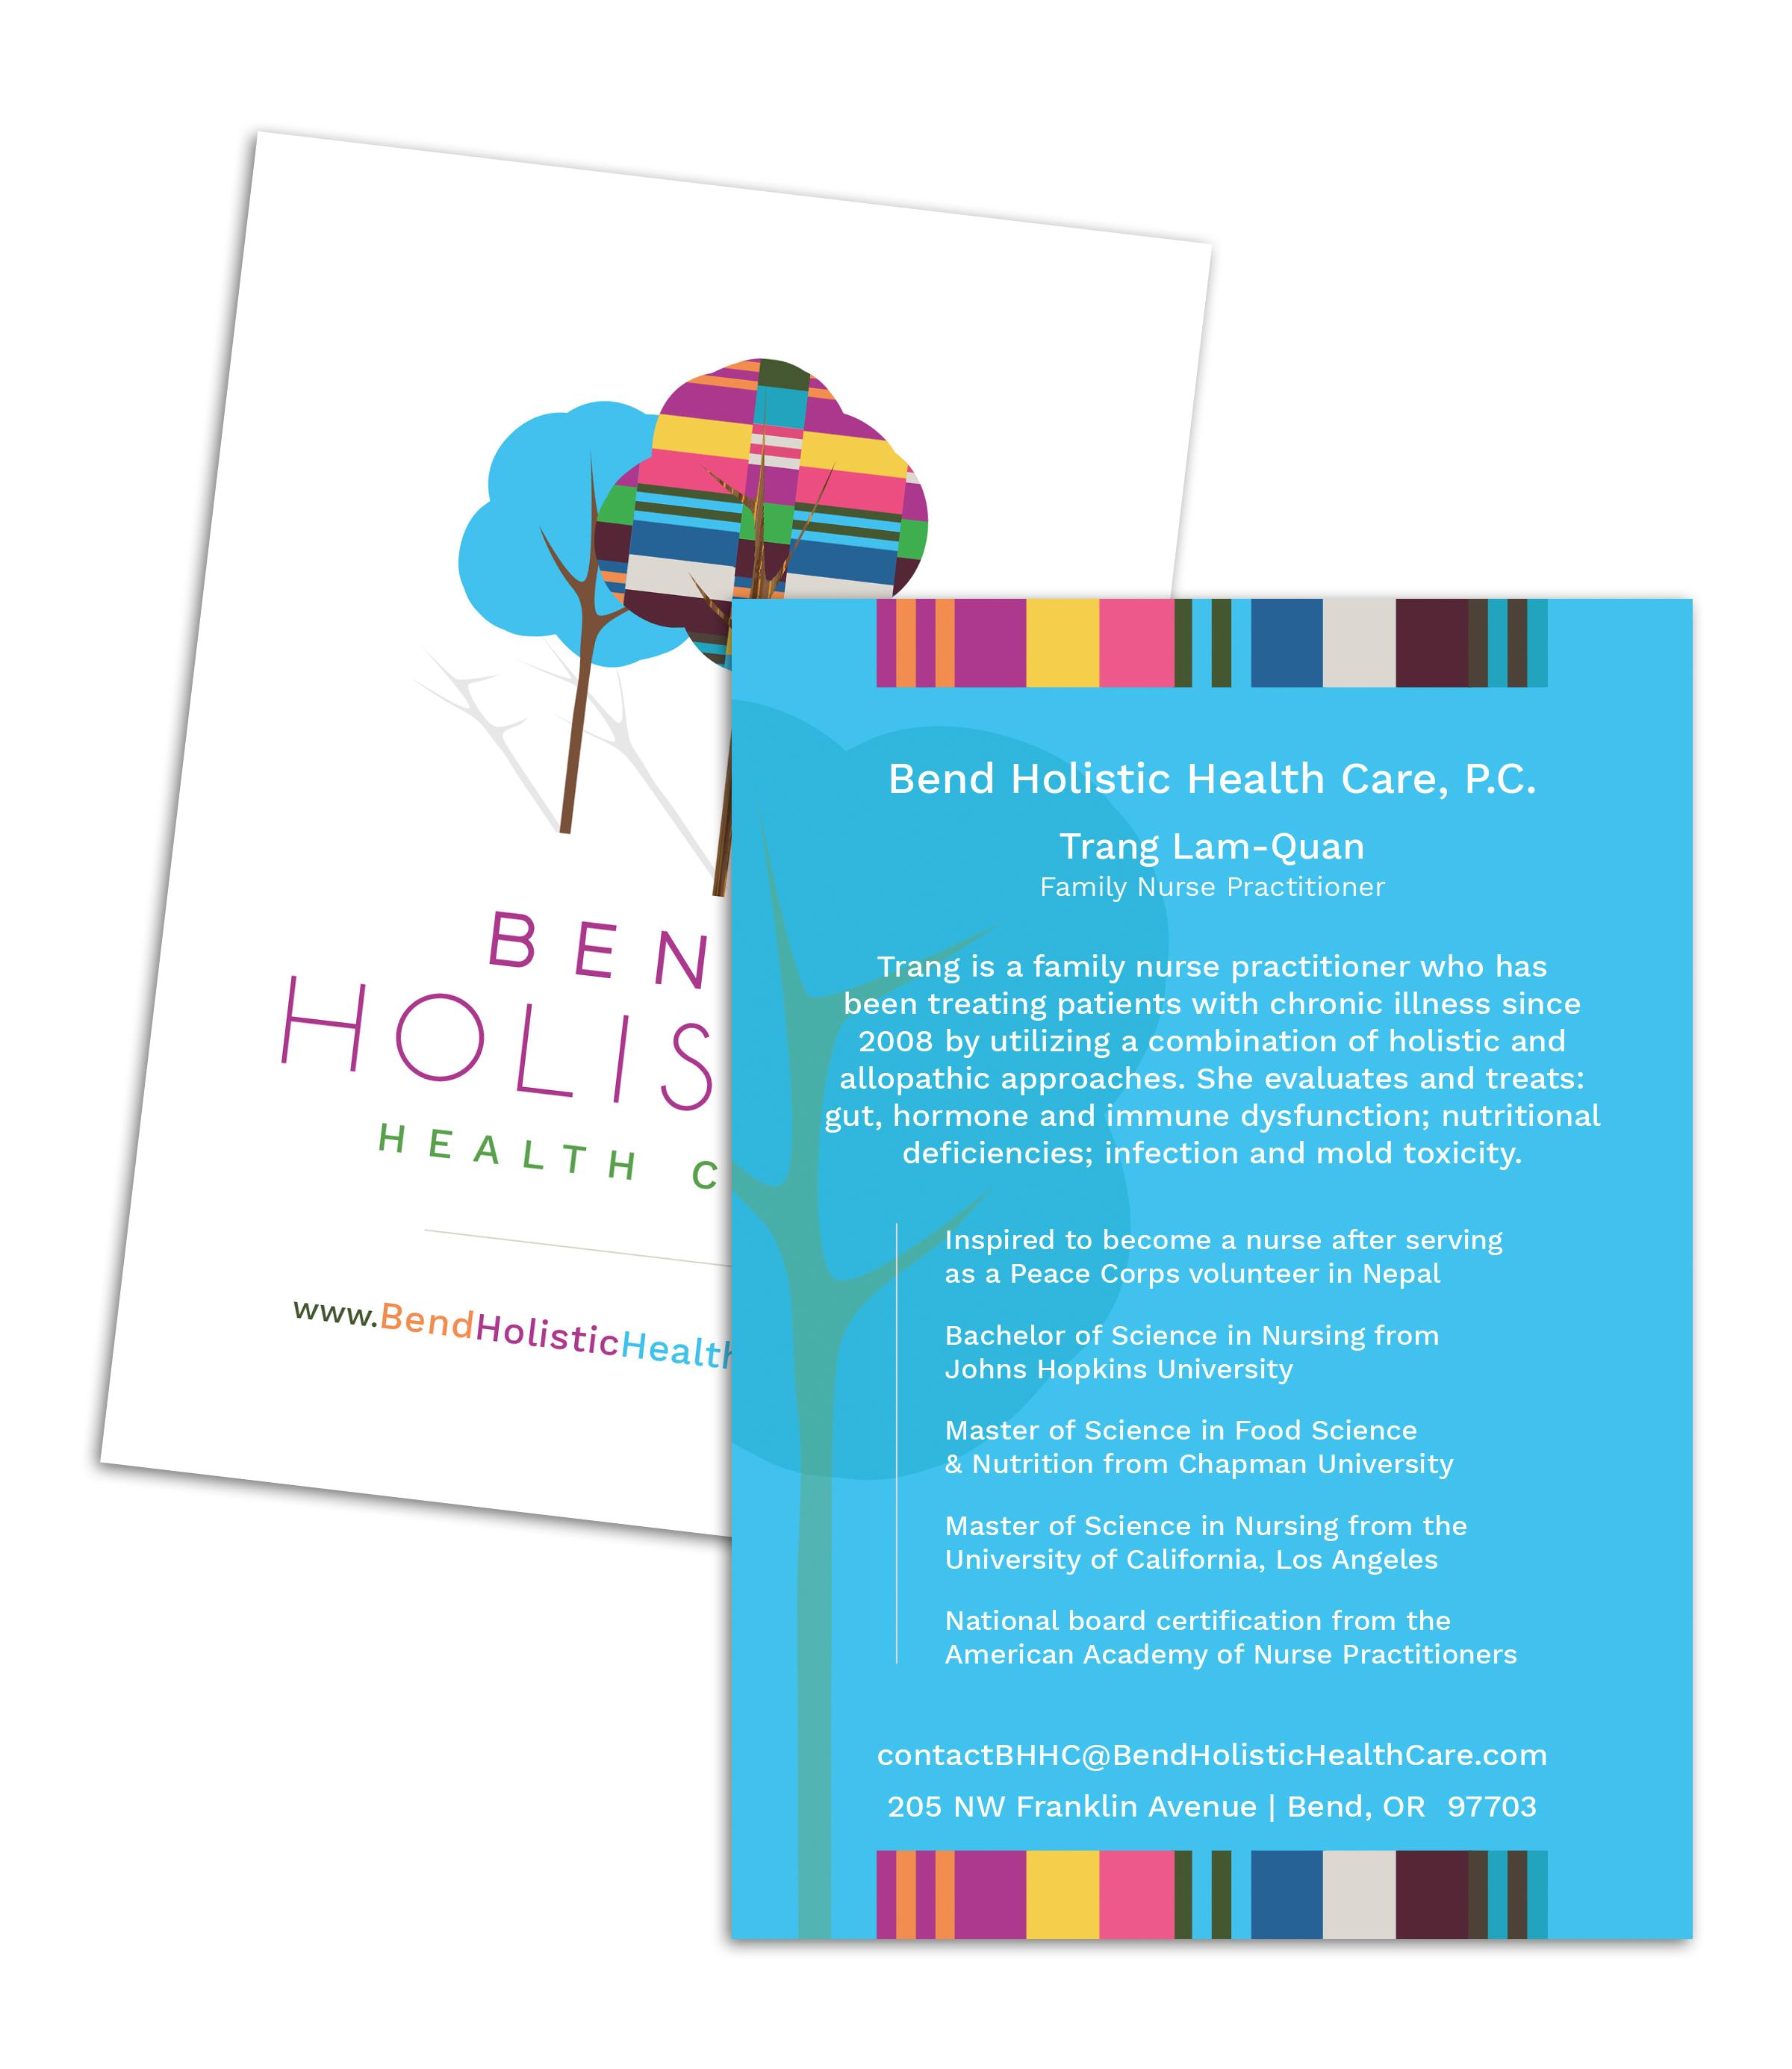 Bend-Holistic-Health-Care-postcard